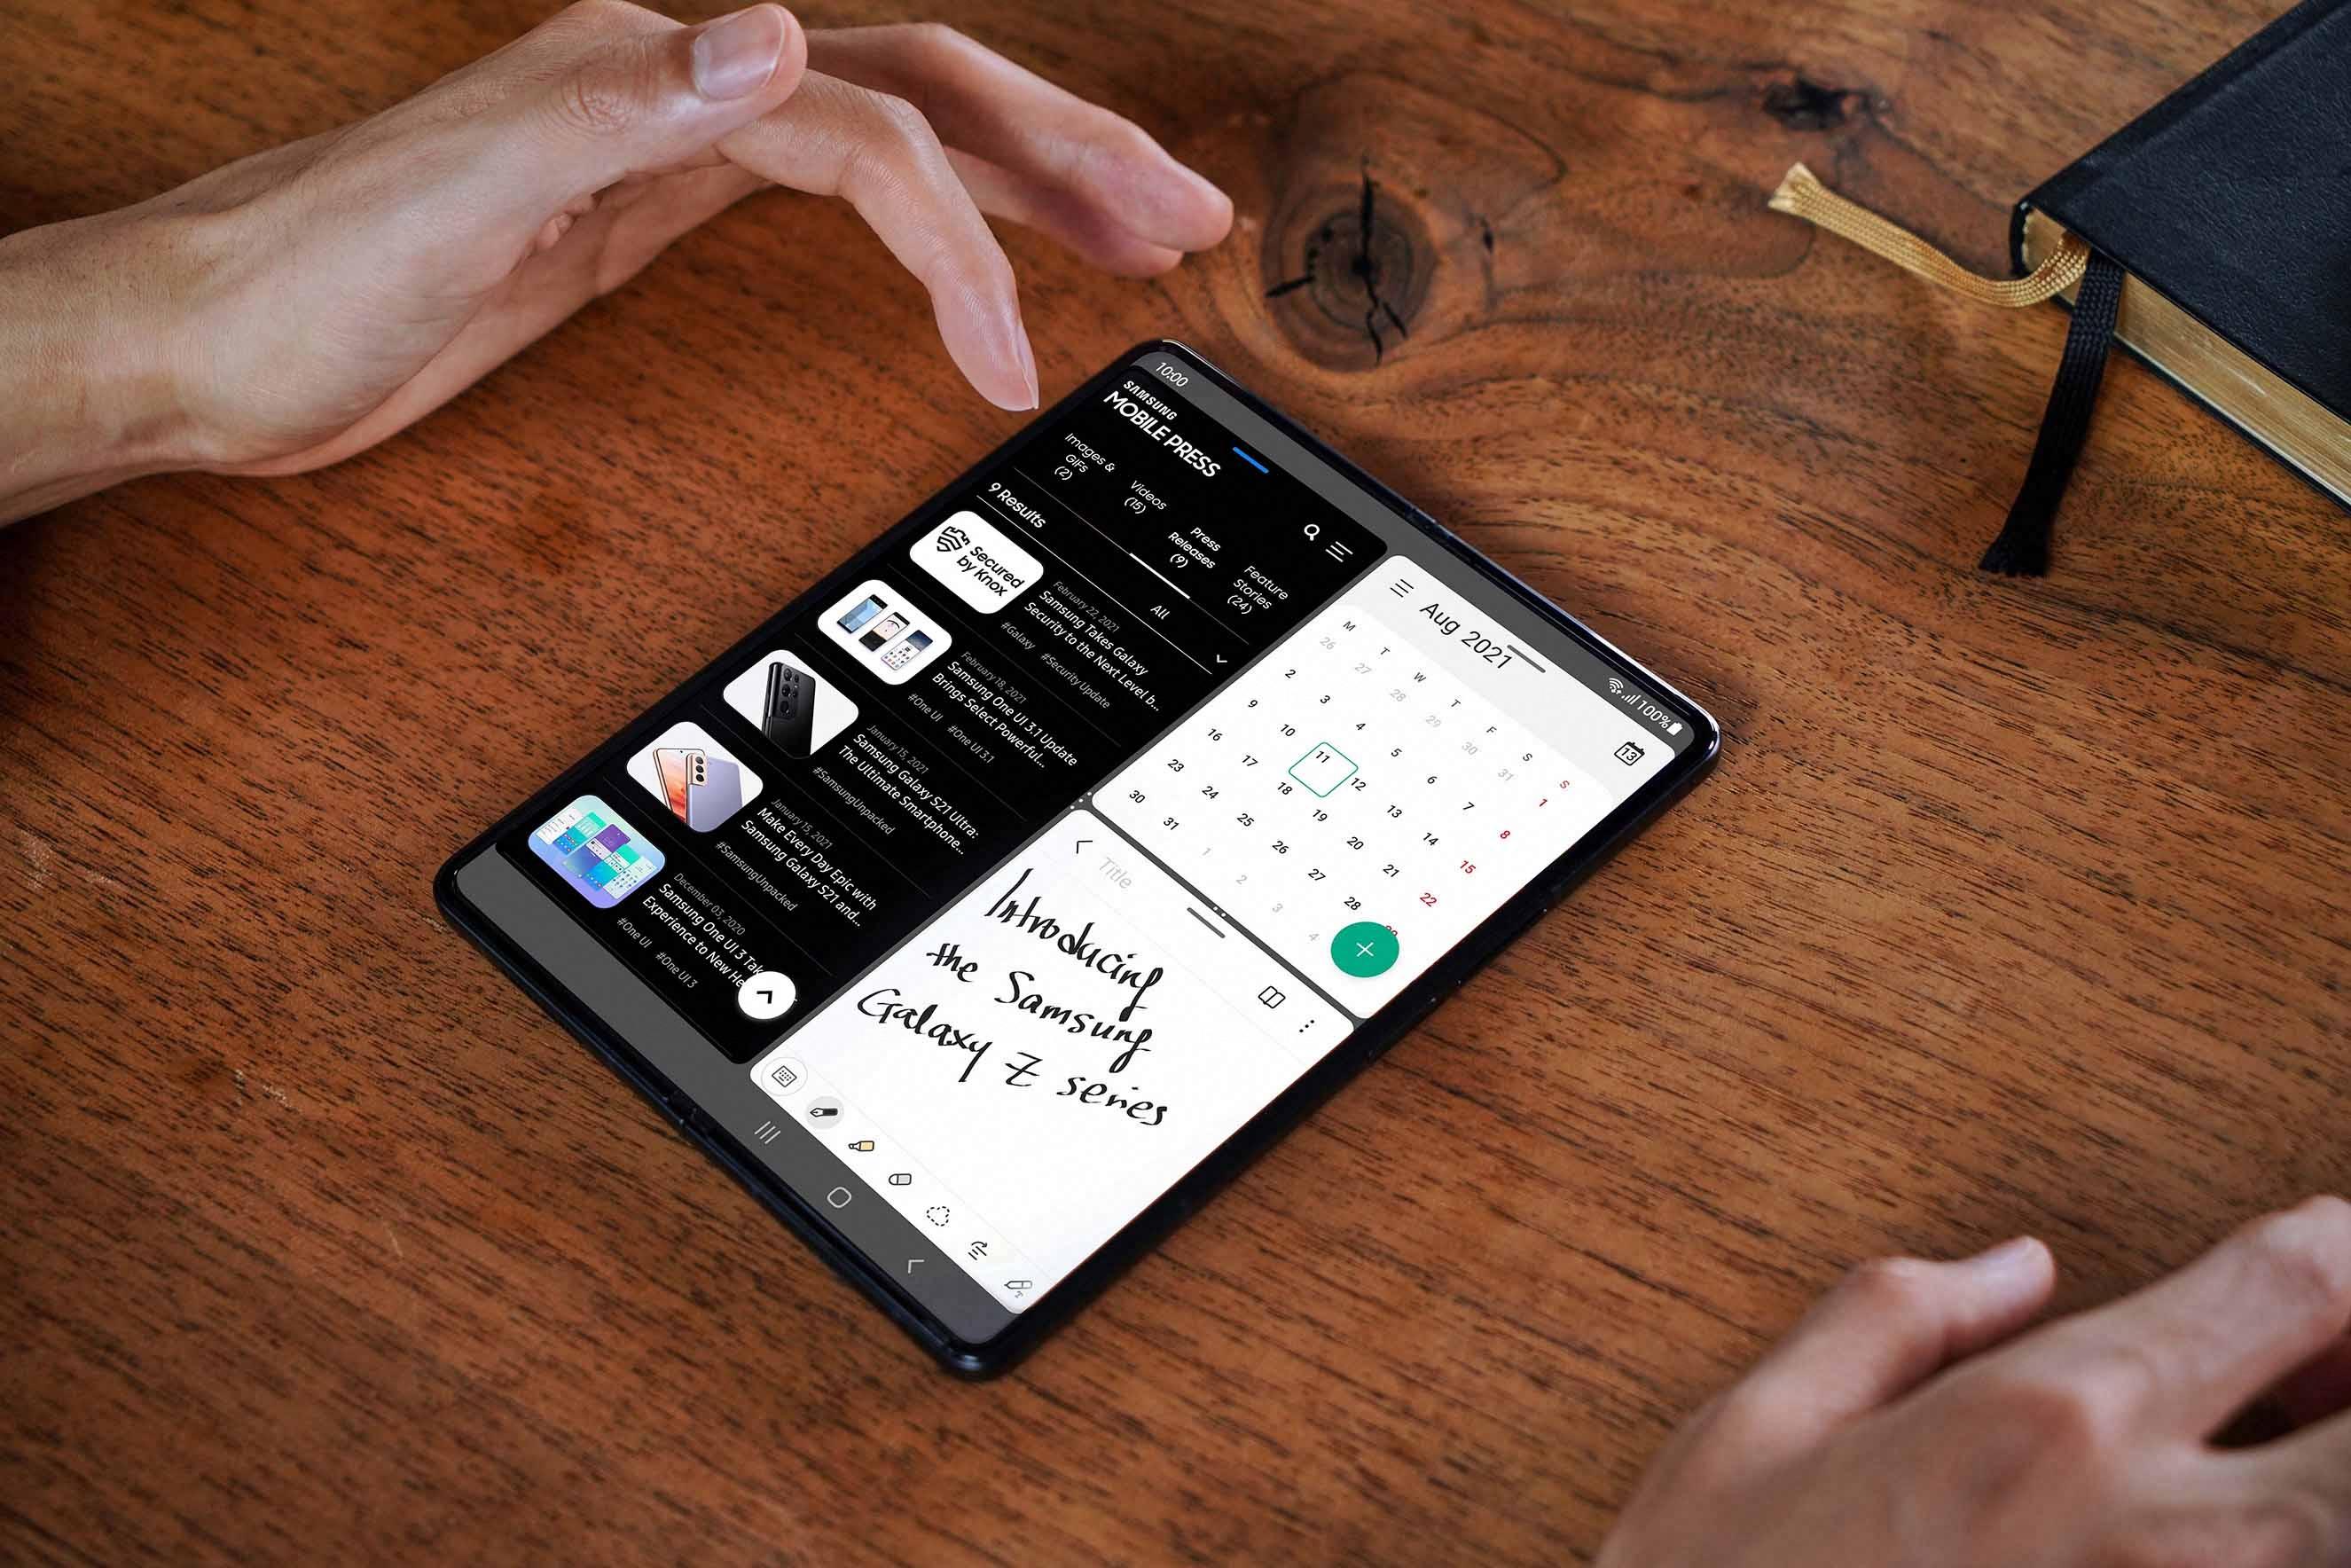 Samsung Galaxy Zfold 3